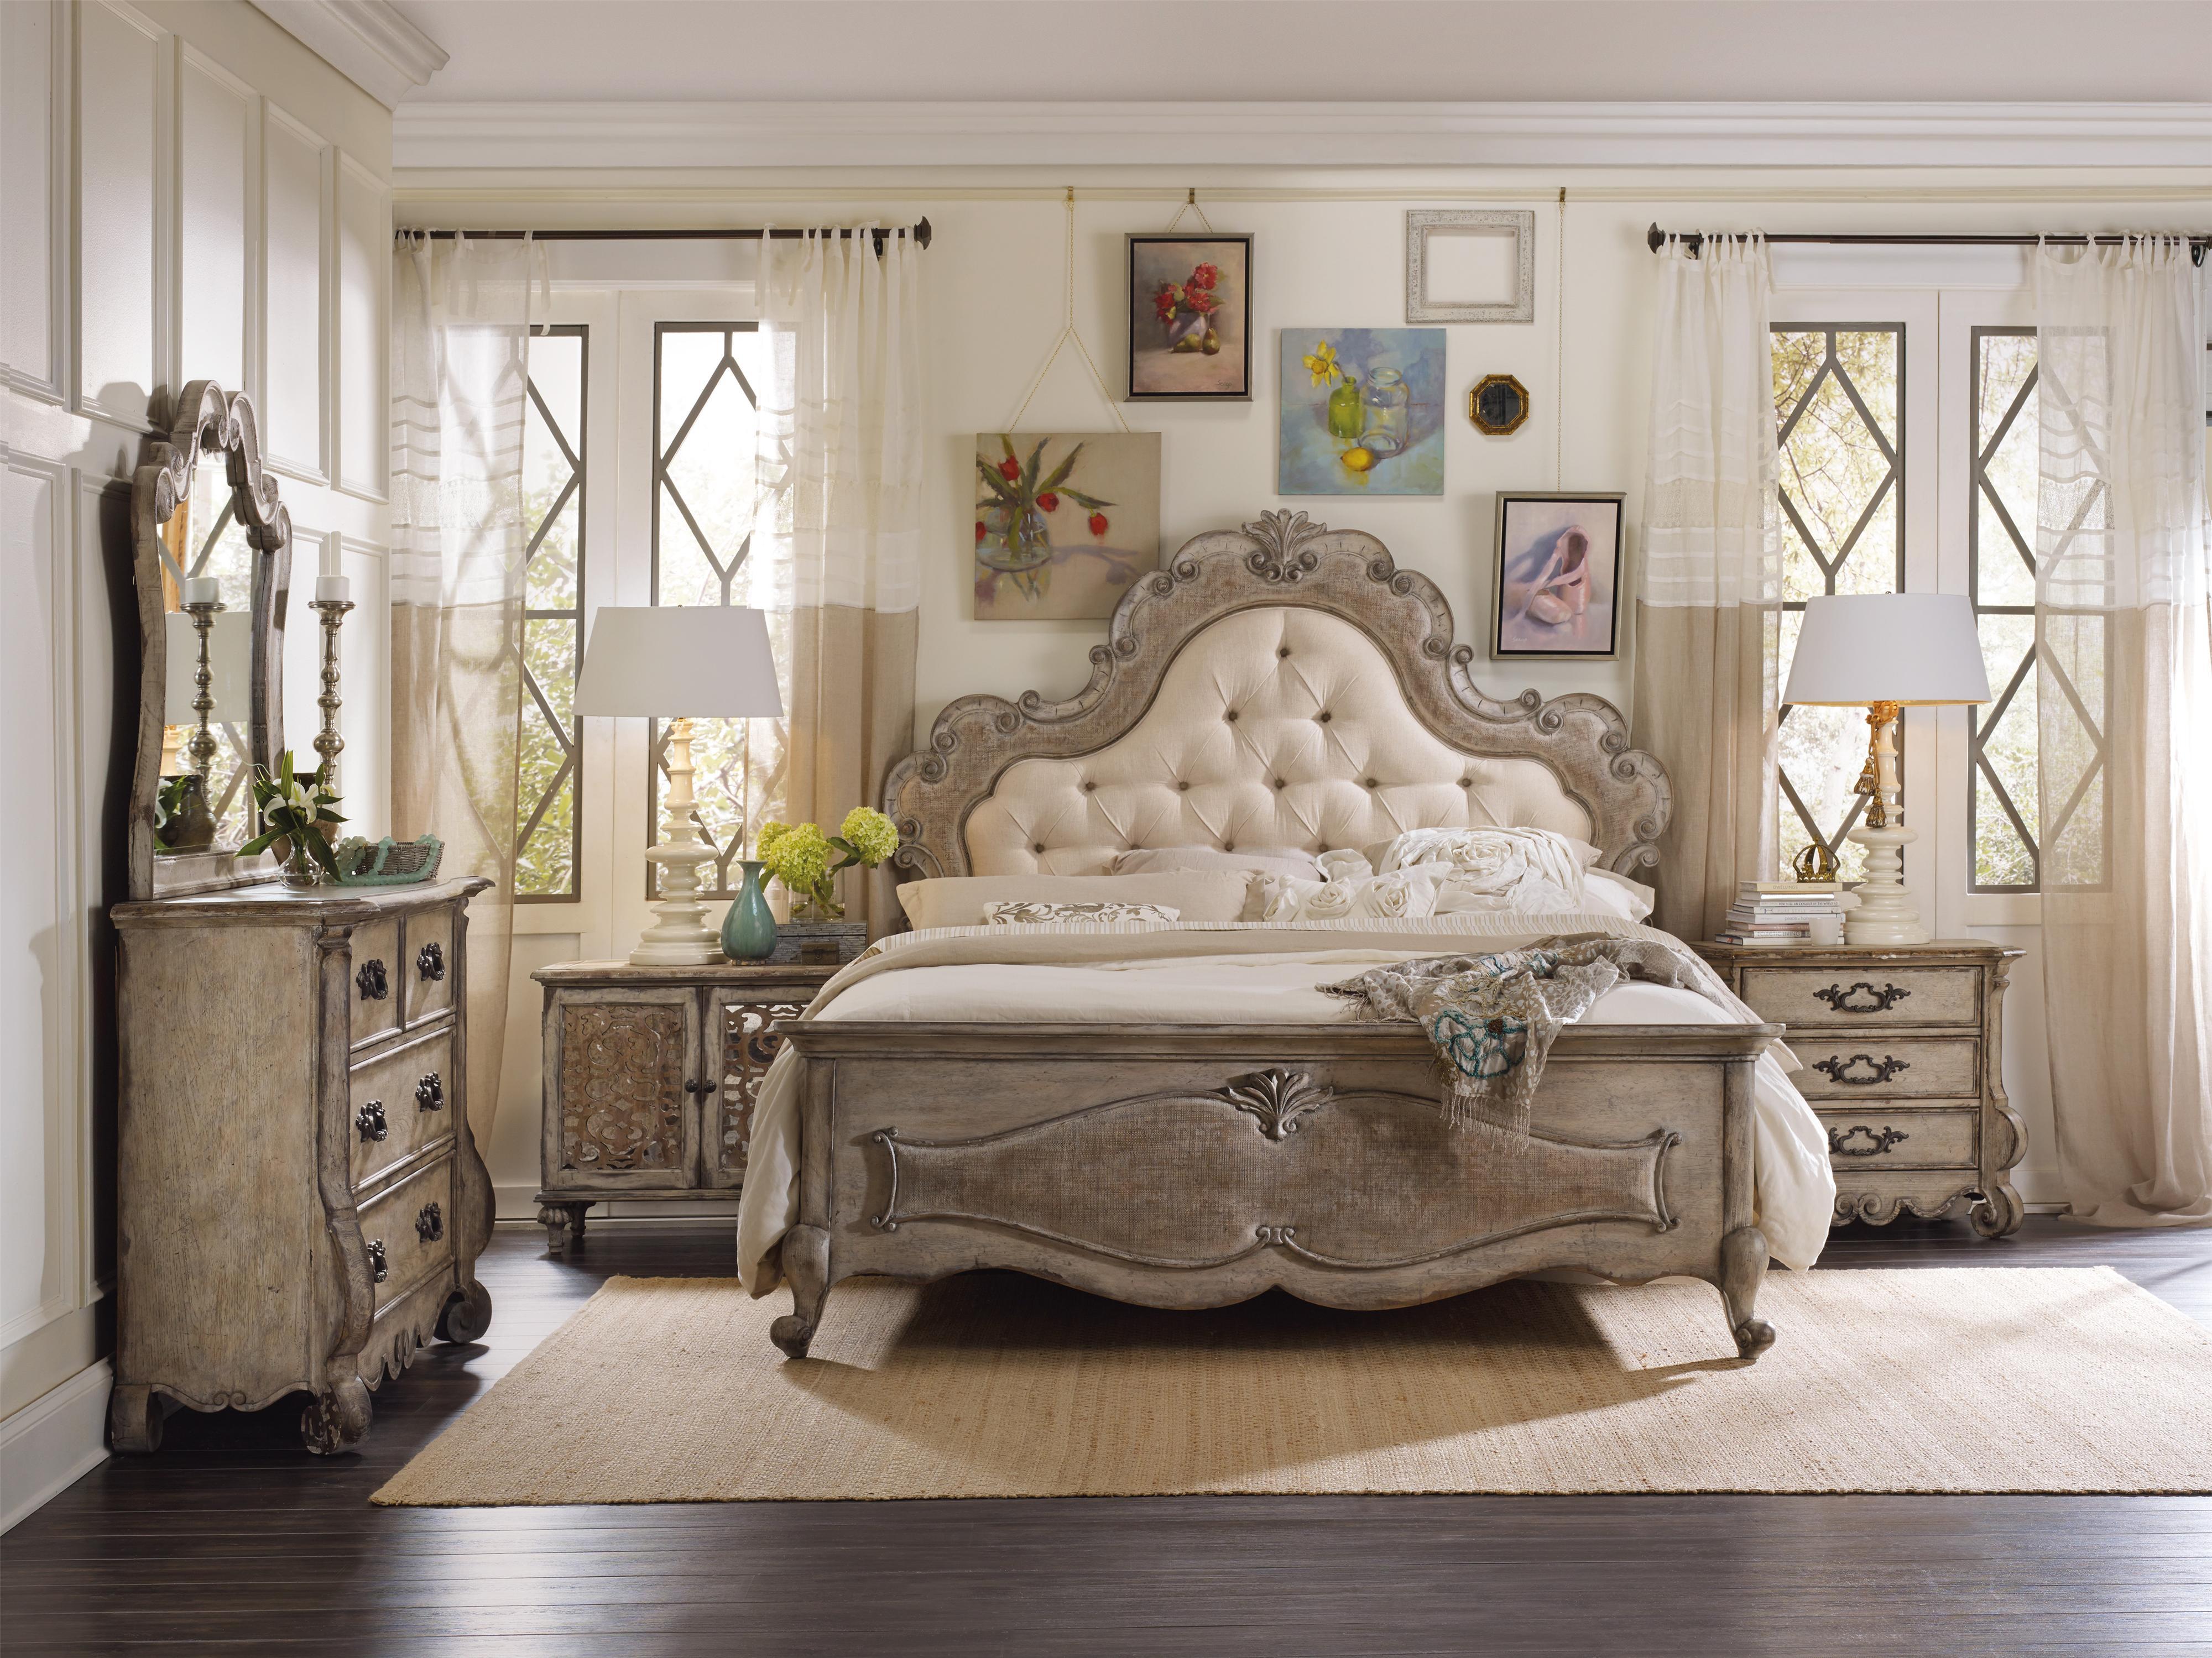 Hooker furniture chatelet king bedroom group belfort for Bedroom fabric ideas